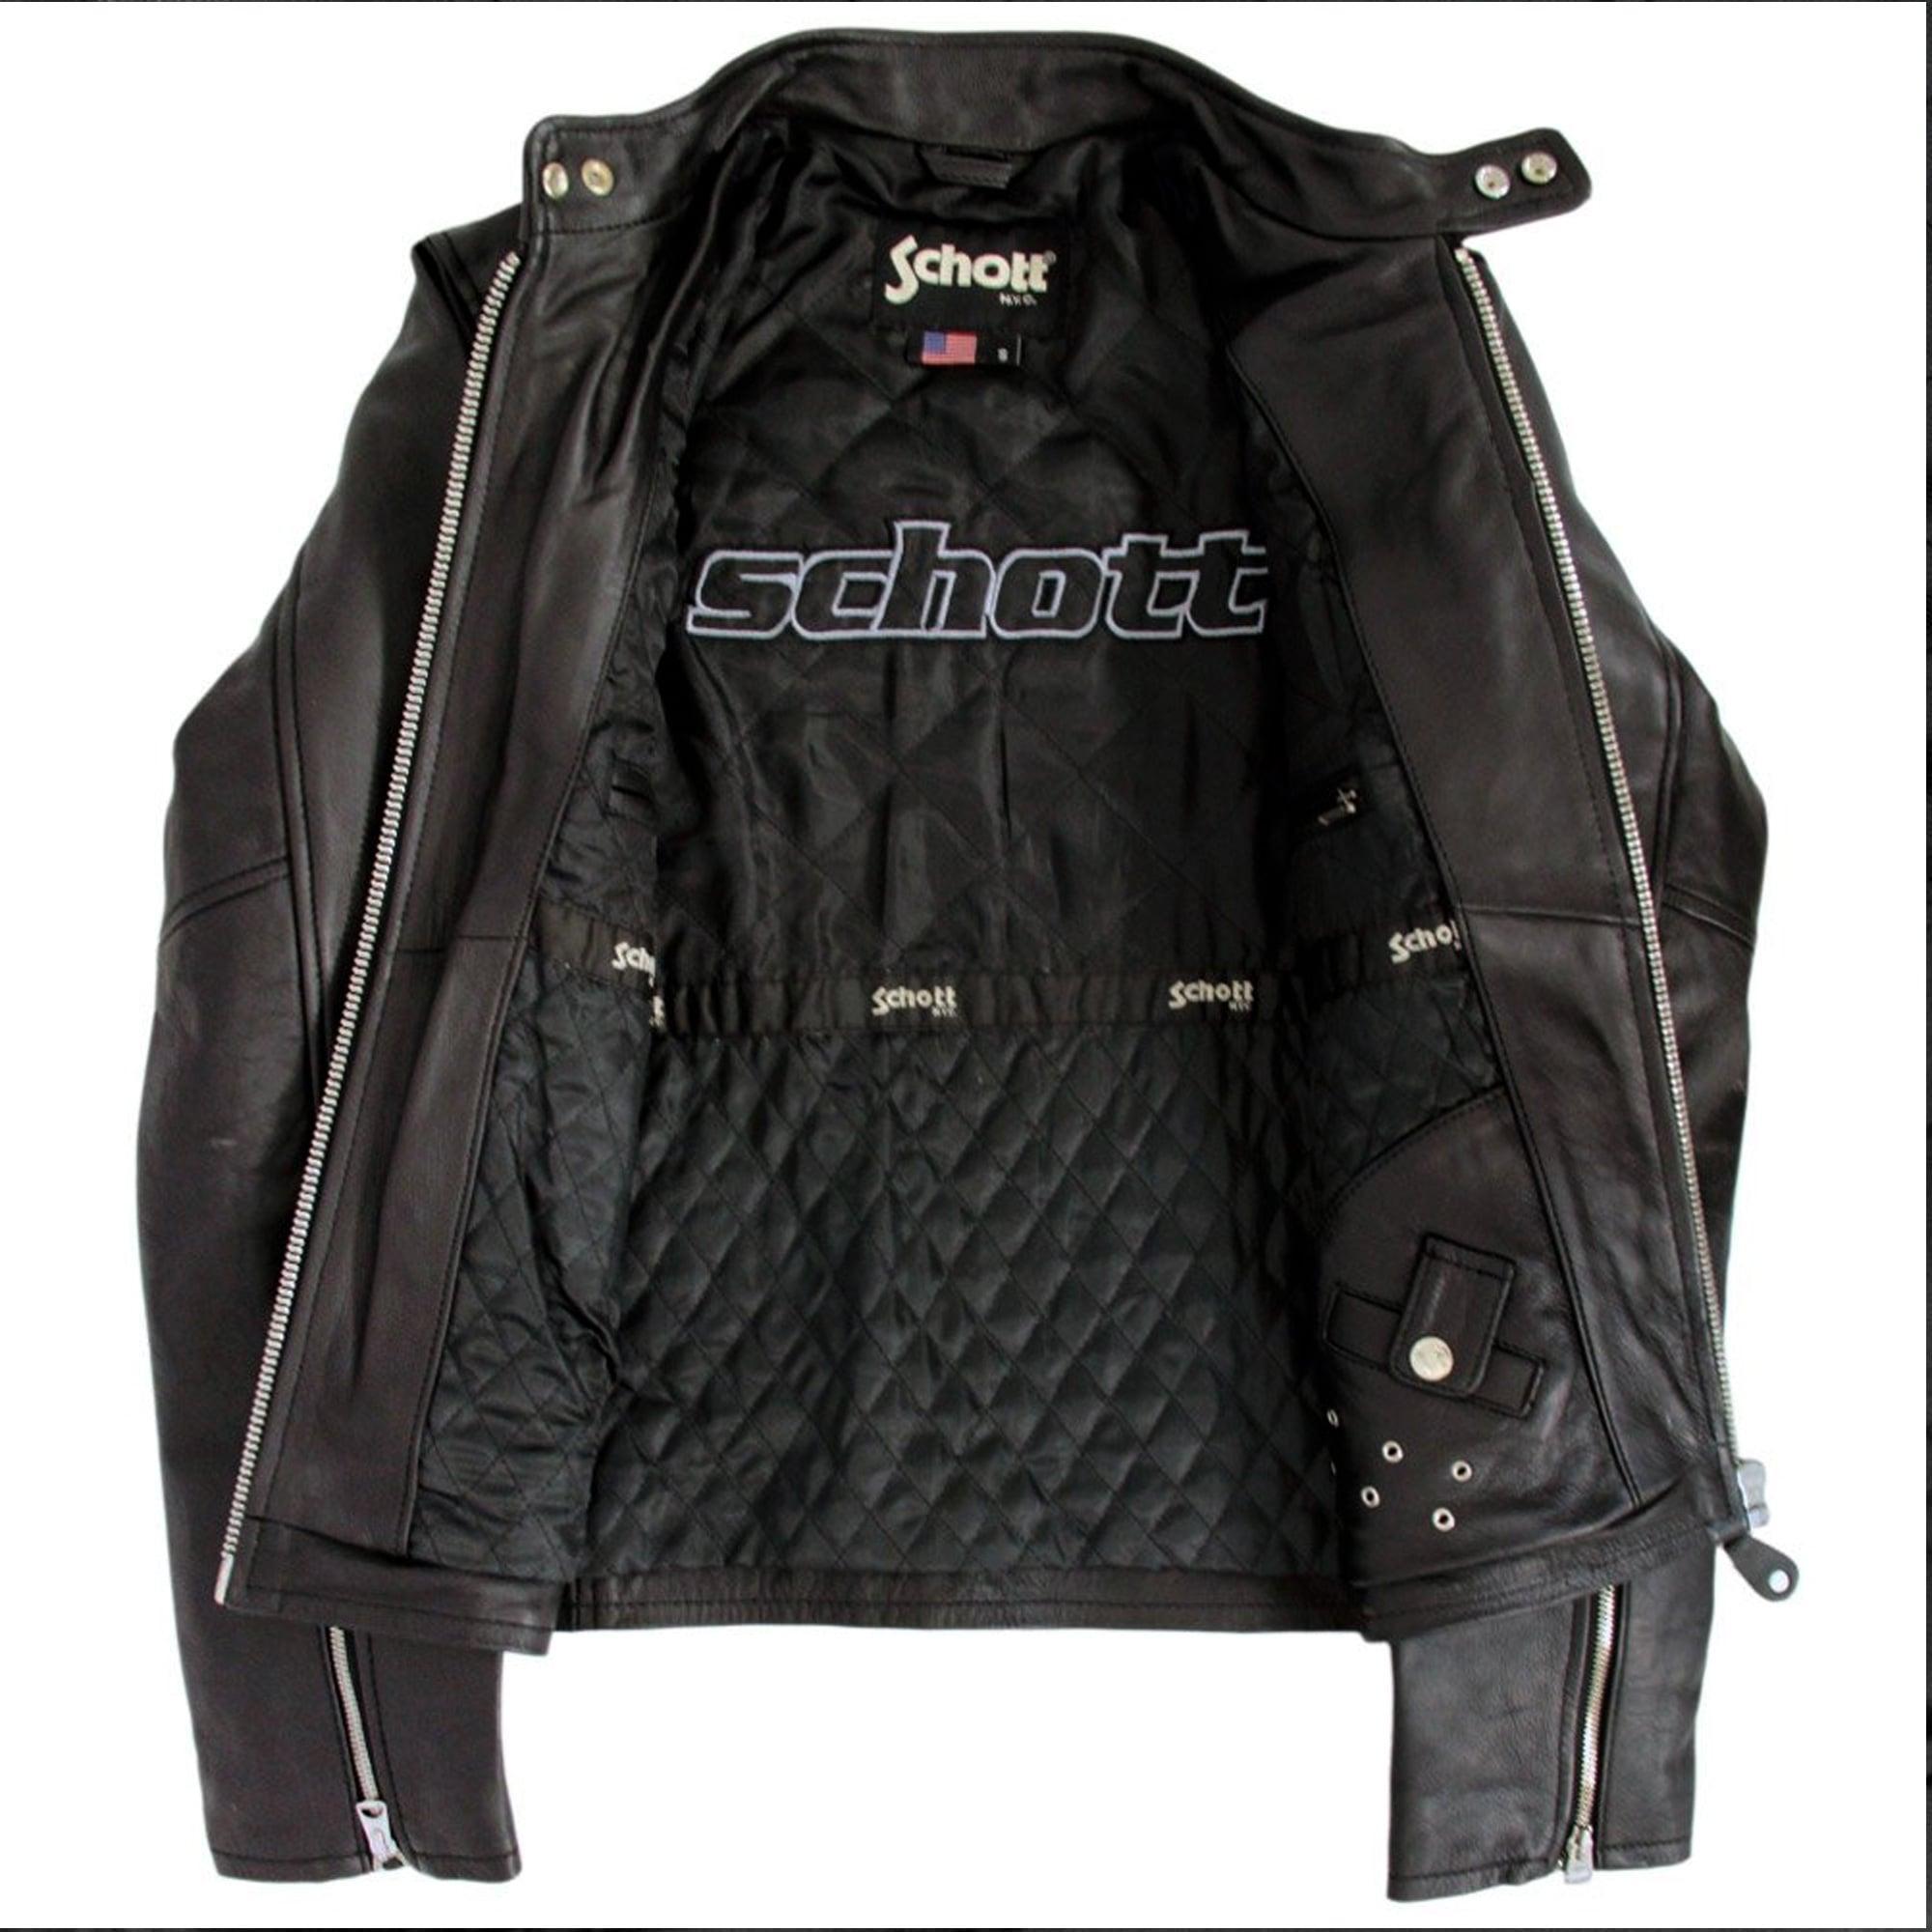 schott nyc jackets scht lc940d blk racer for men lyst. Black Bedroom Furniture Sets. Home Design Ideas